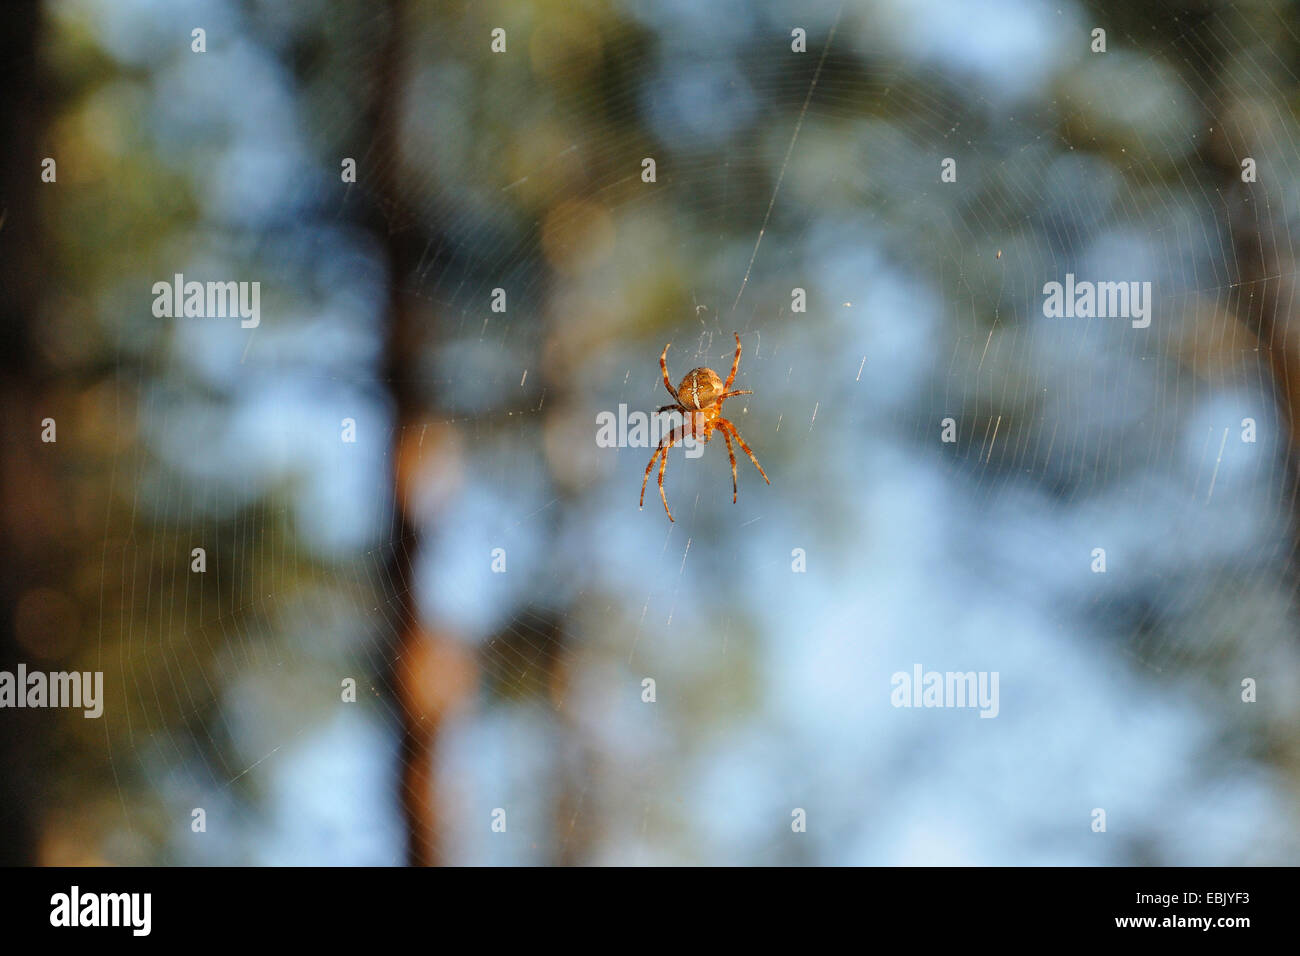 (The orbweavers incliner &AMP; the orbweavers) roundshouldered (Araneus spec.), Araneus assis sur spider web, Allemagne, Rhénanie du Nord-Westphalie Banque D'Images